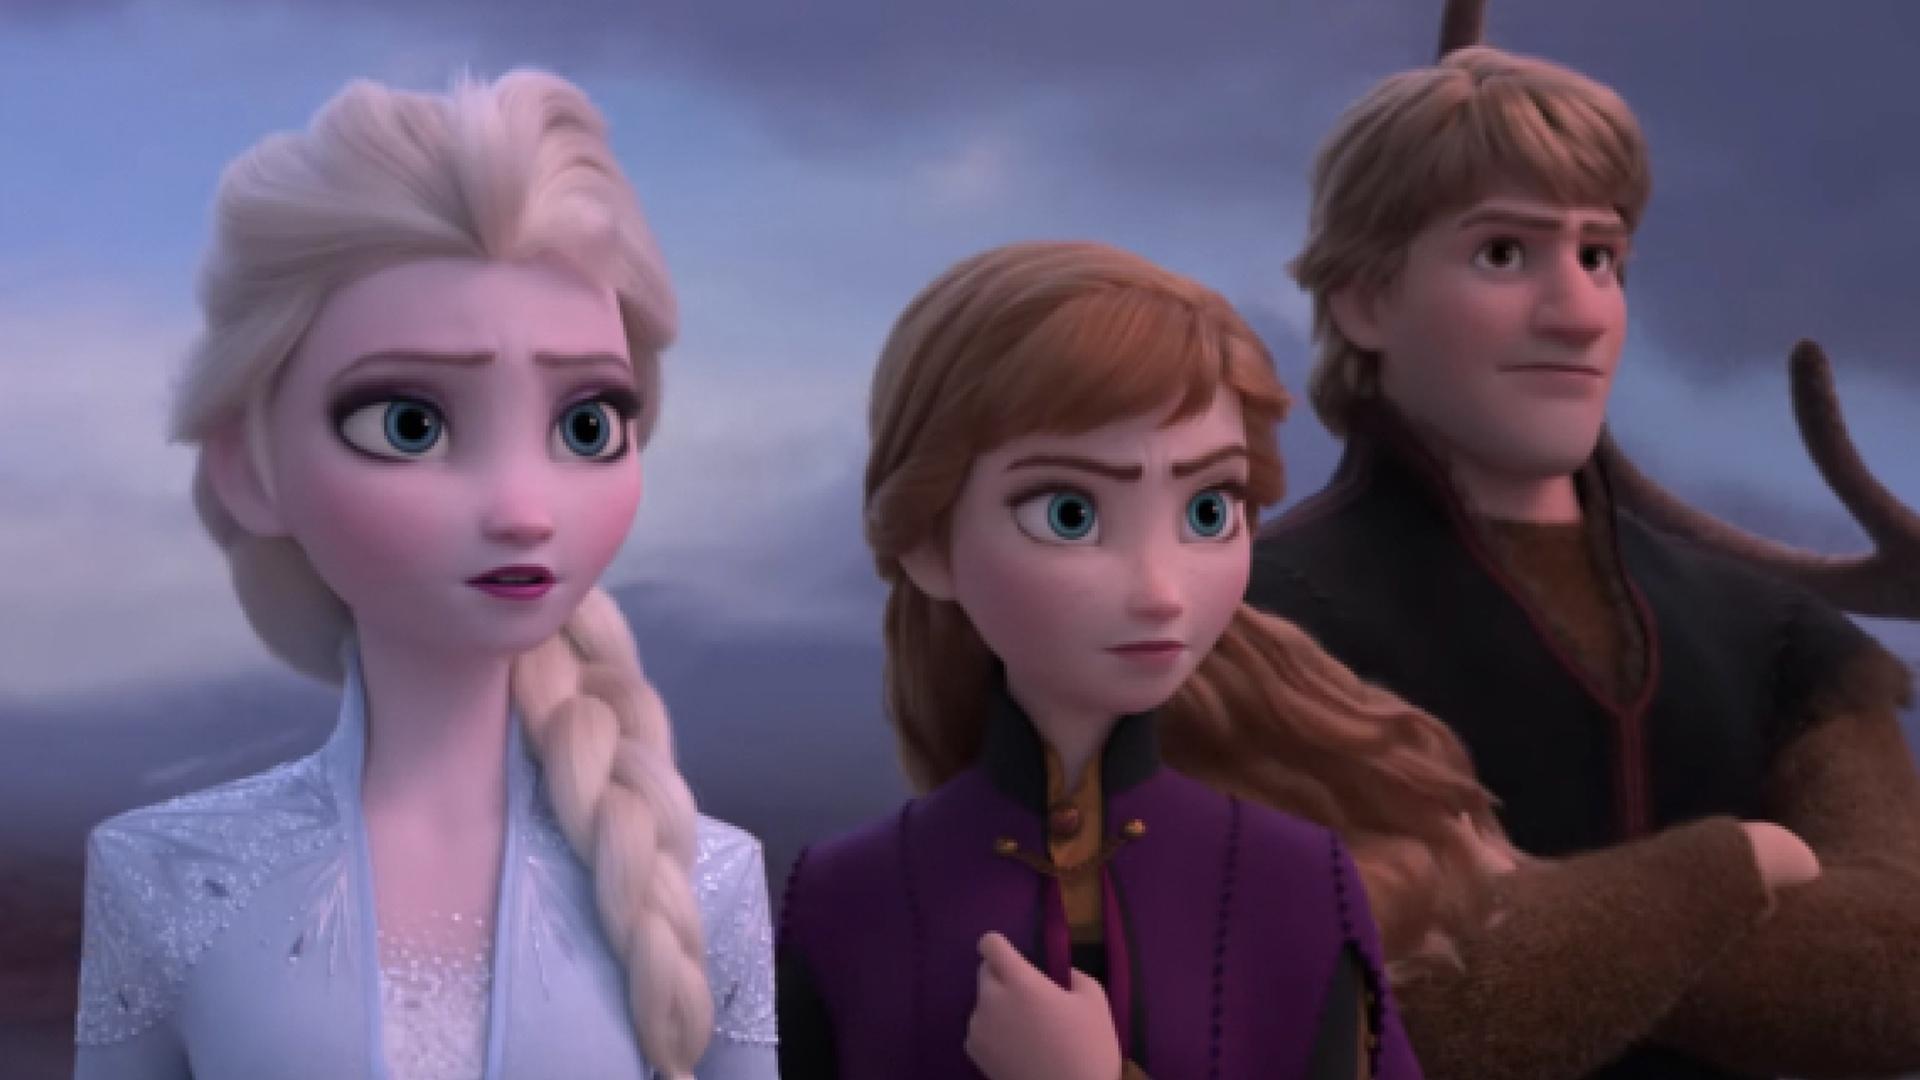 Трейлер: Холодное сердце 2 (Frozen II)